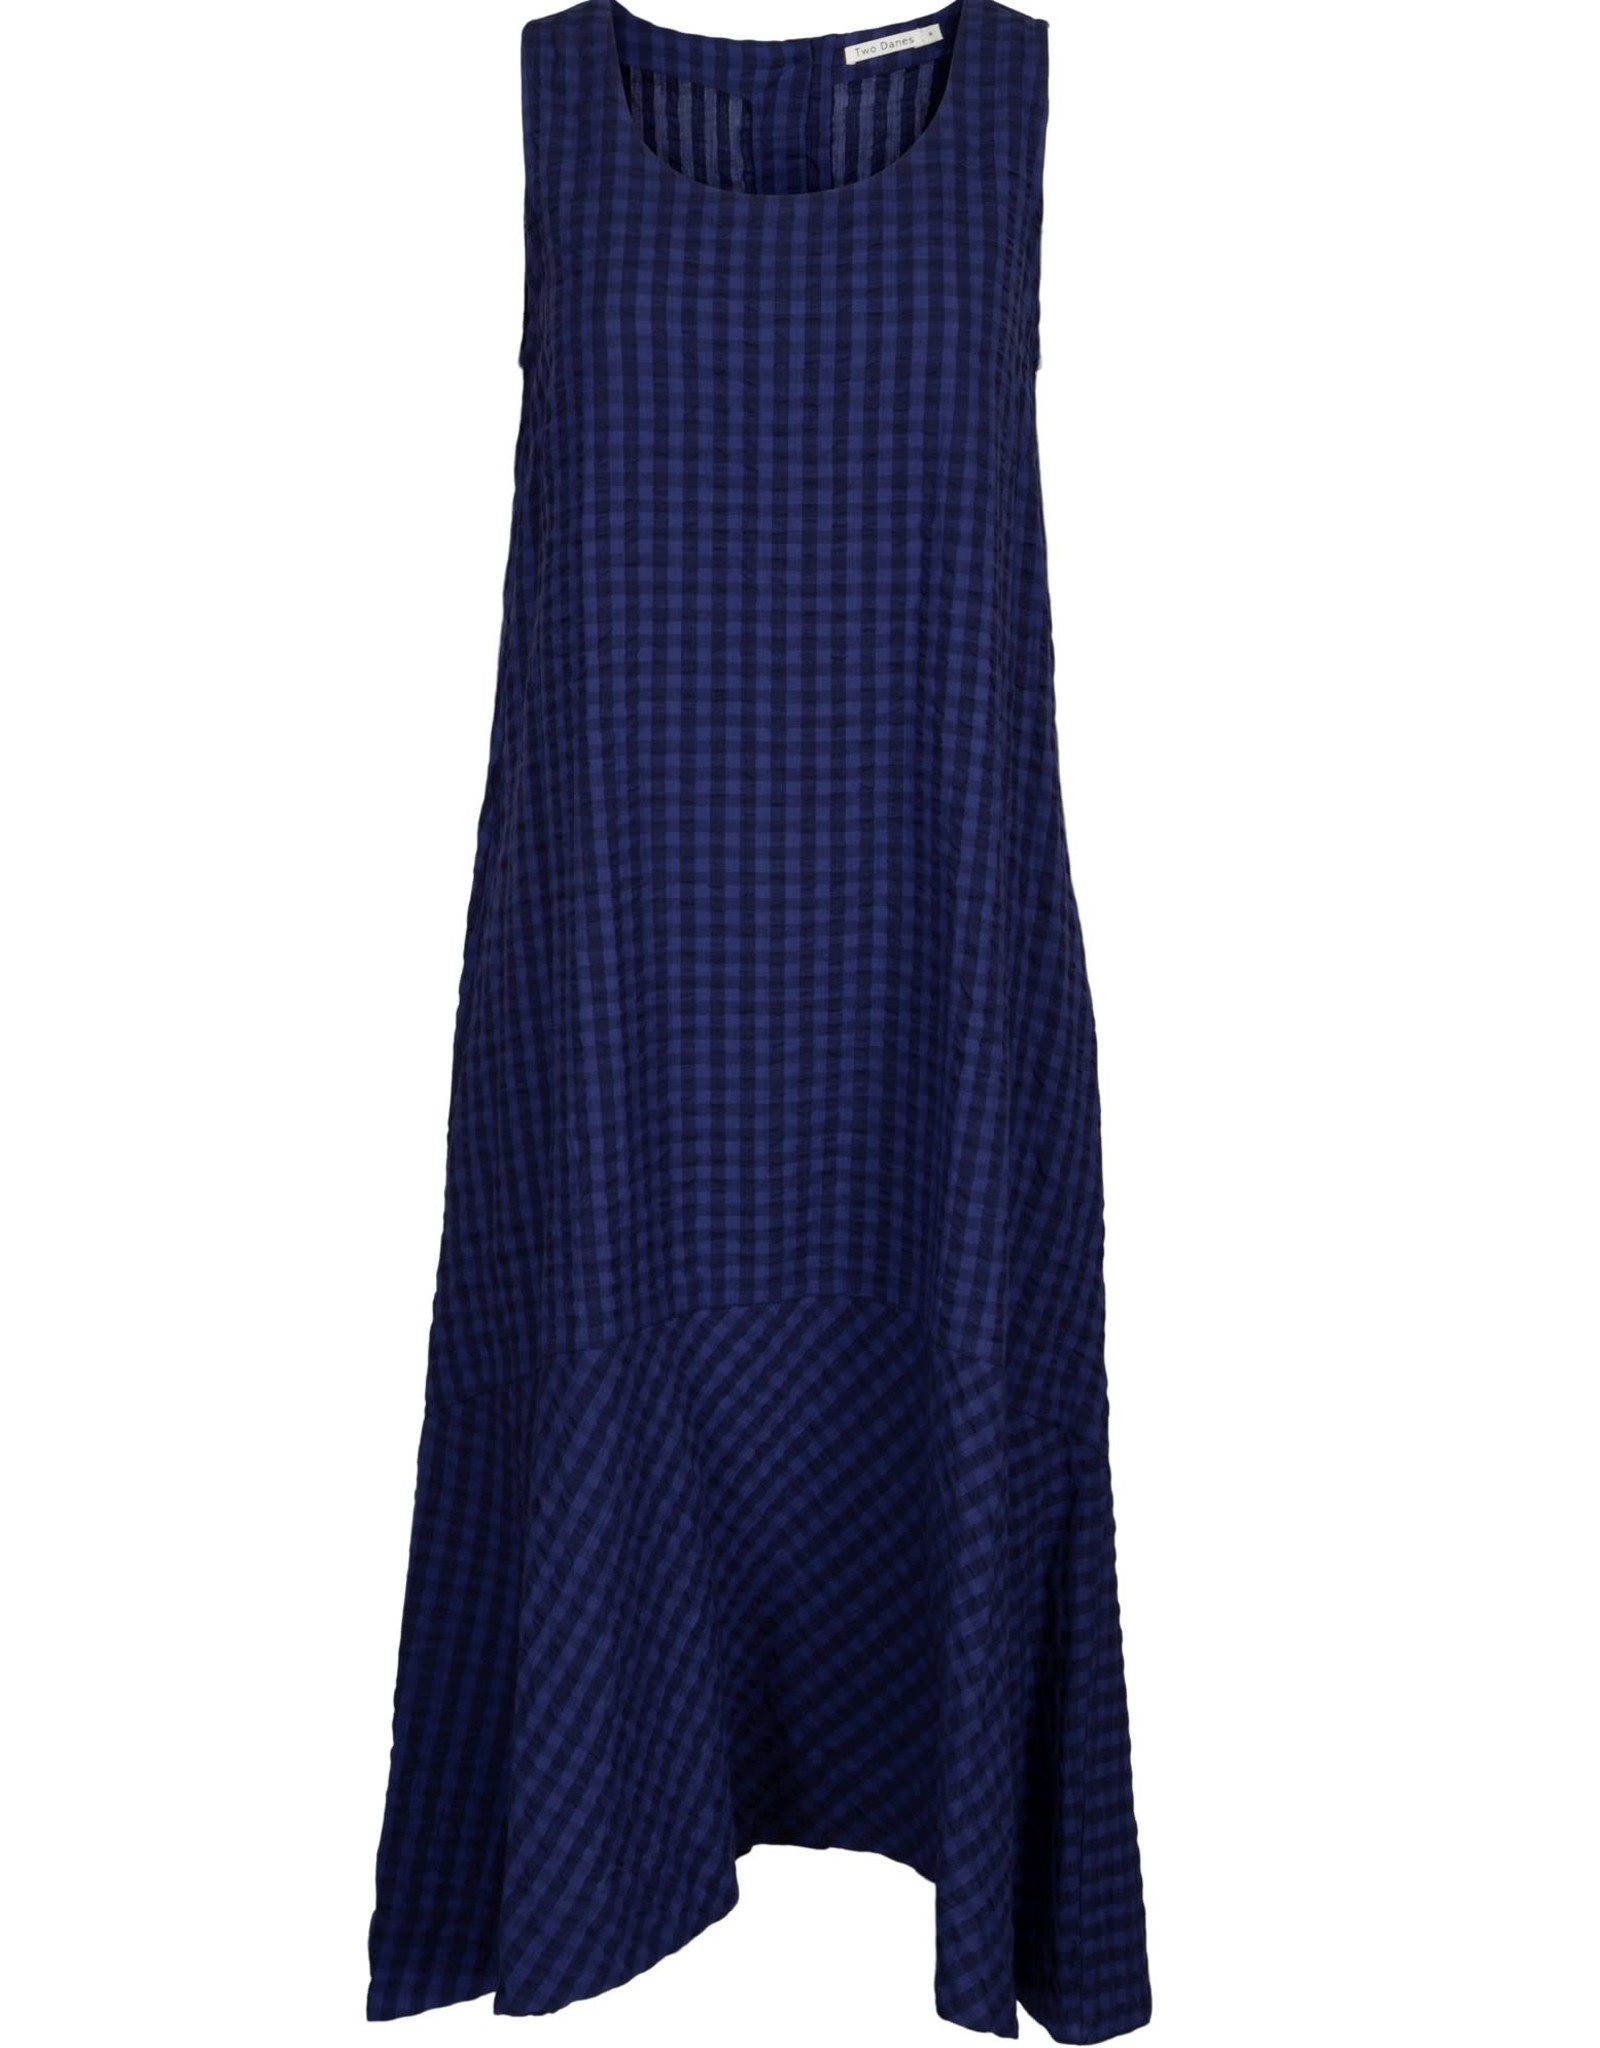 TWO DANES 33596 sienna seersucker dress